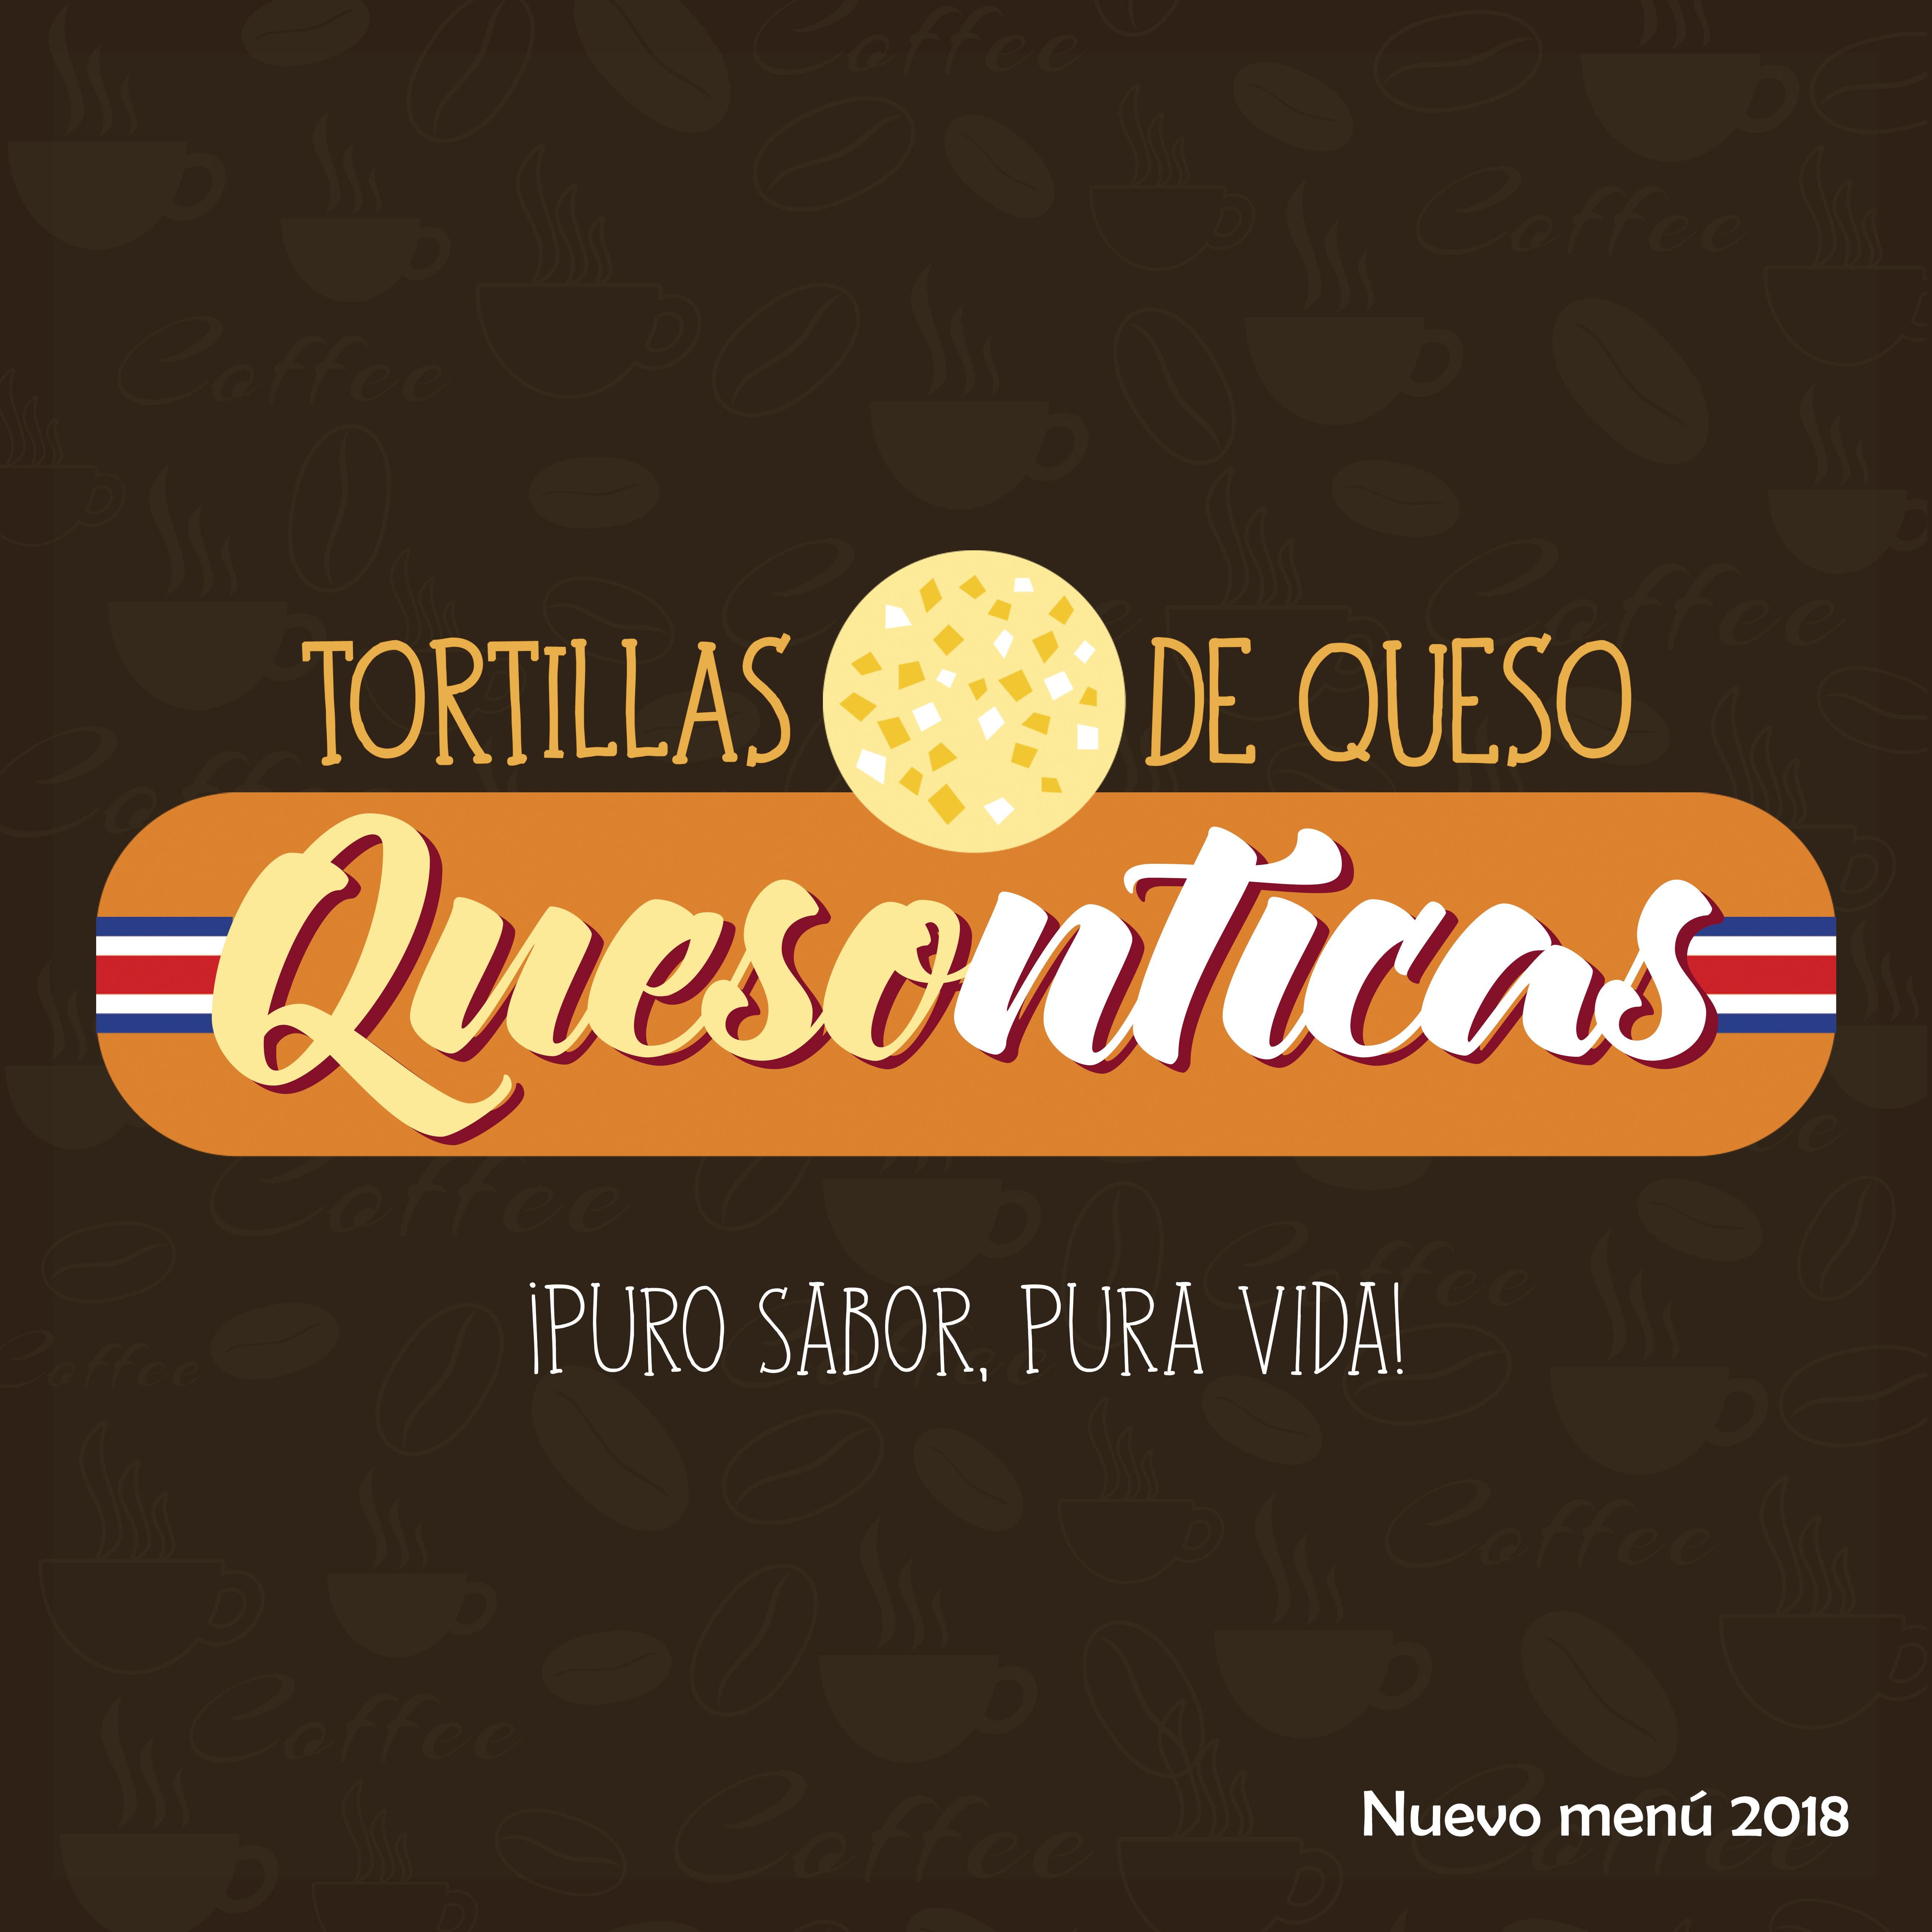 QUESONTICAS San Pedro logo